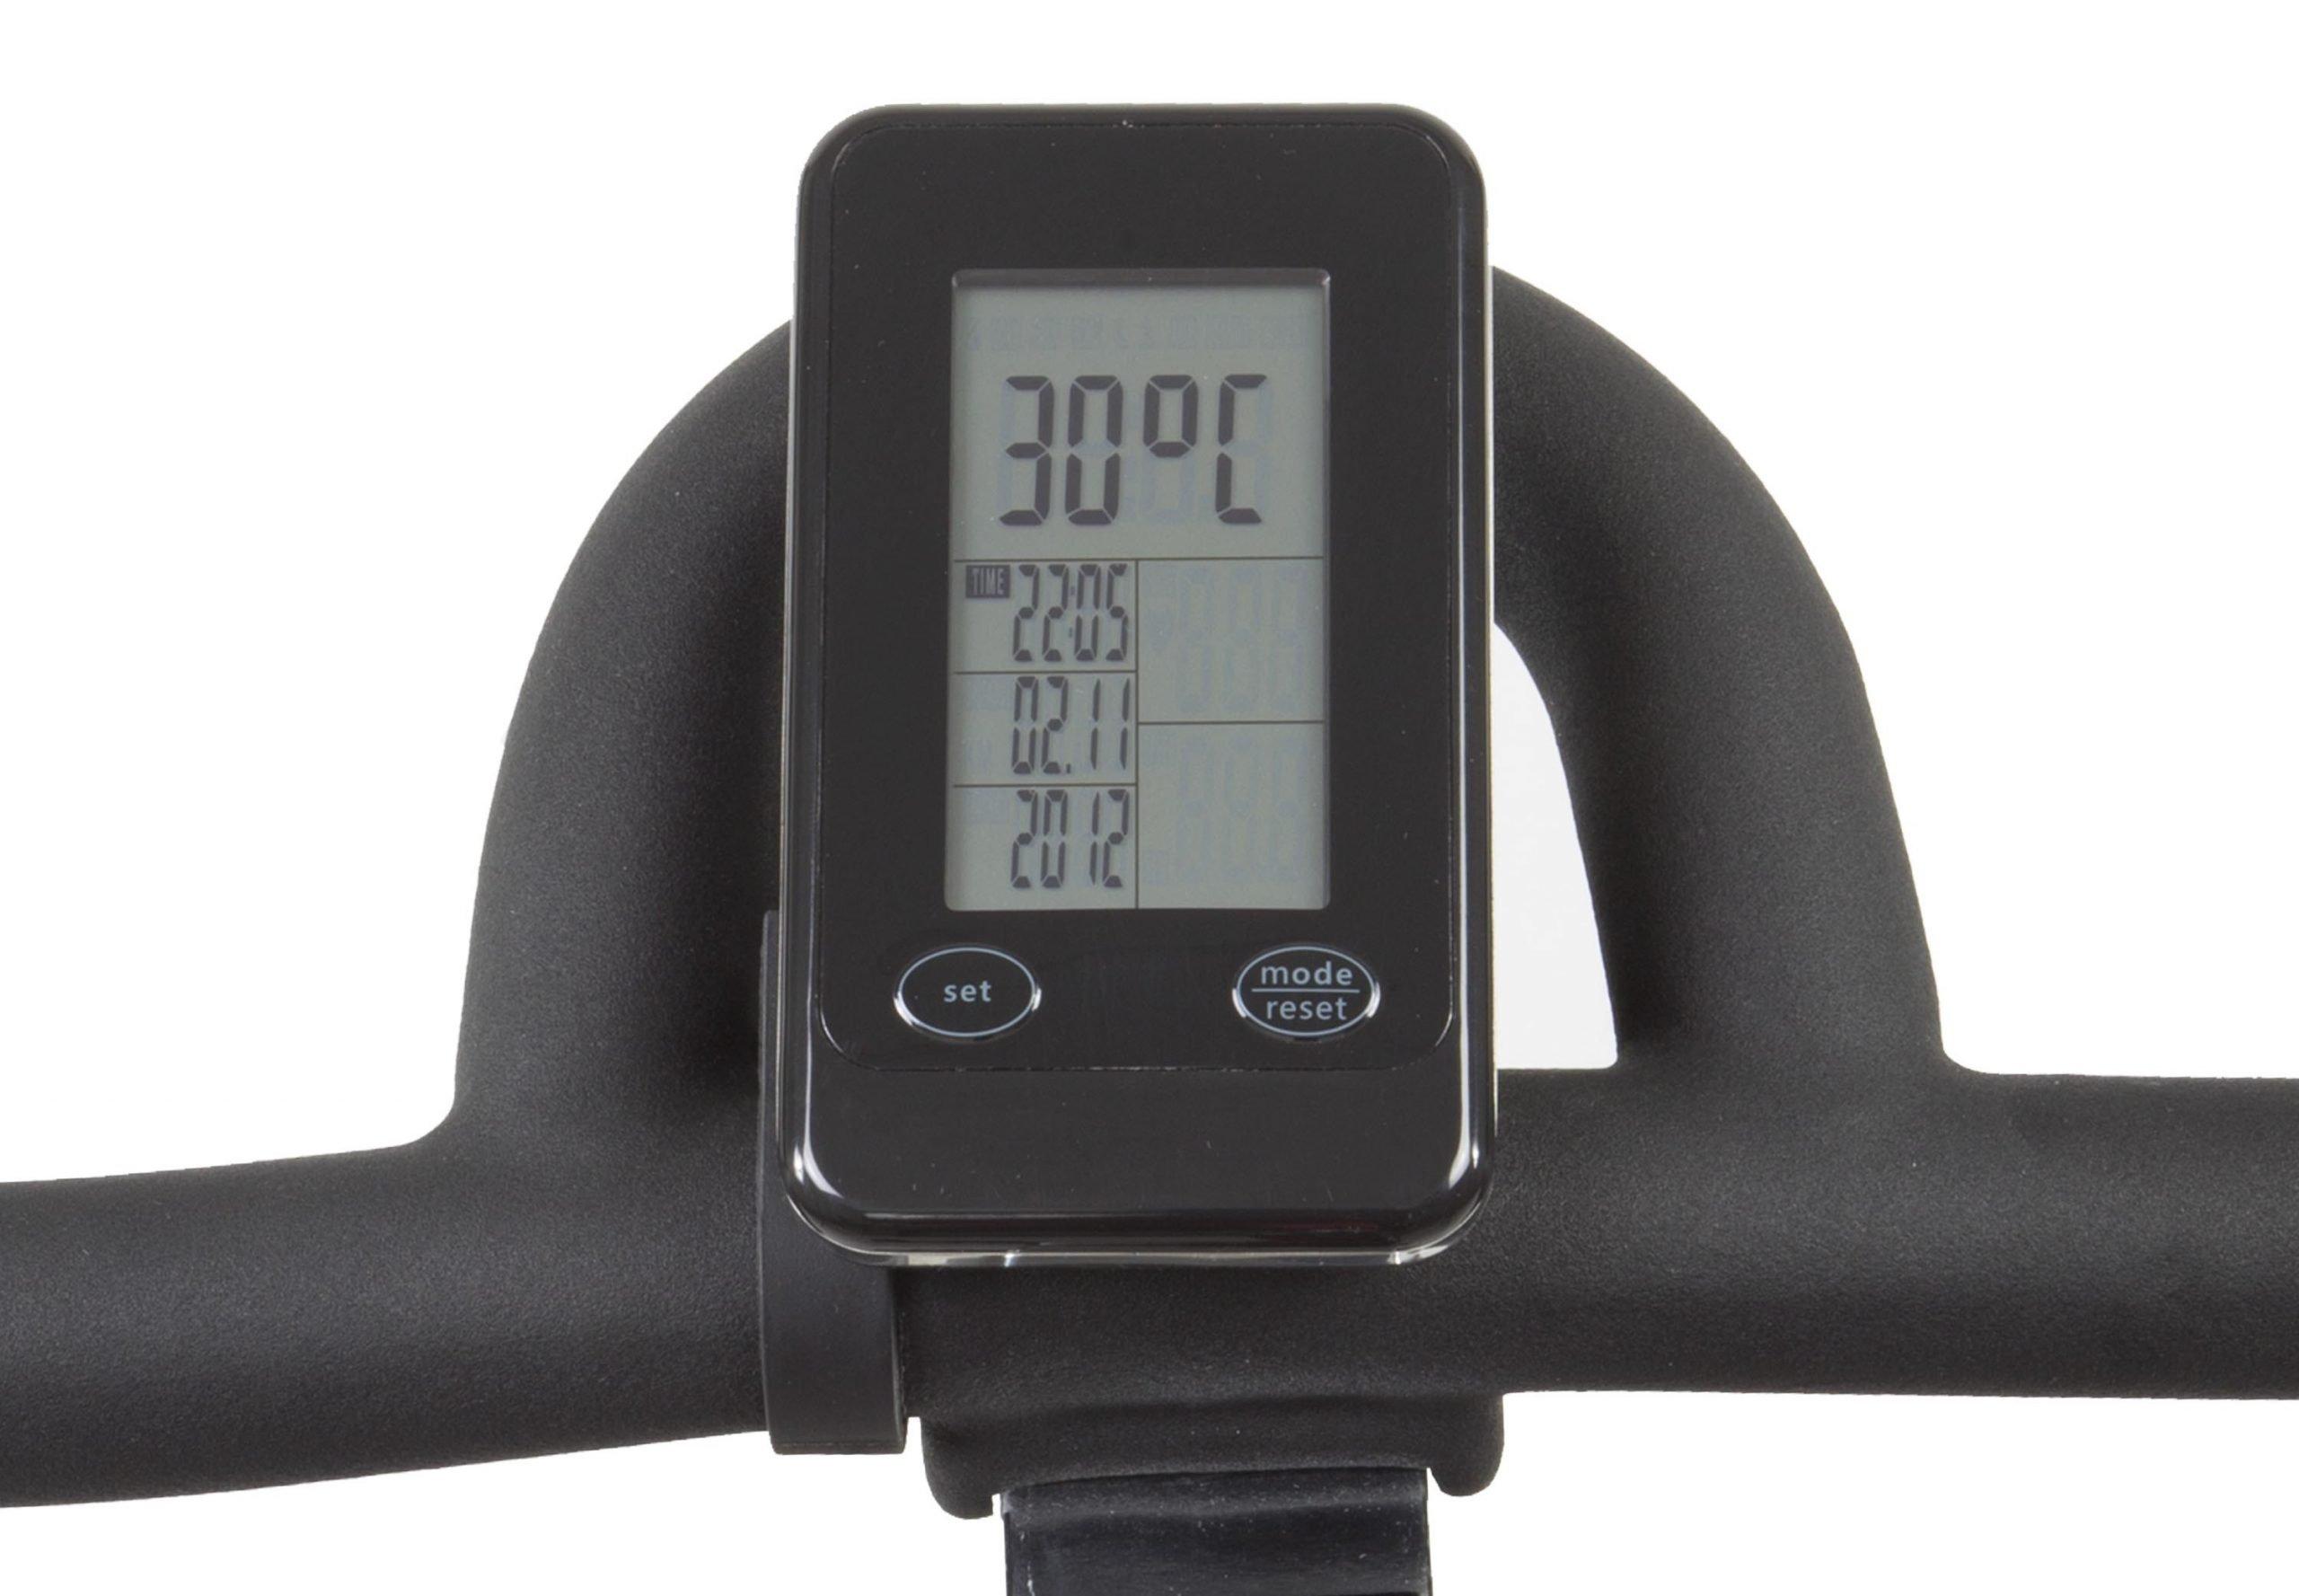 JK FITNESS - Cyclette JK526